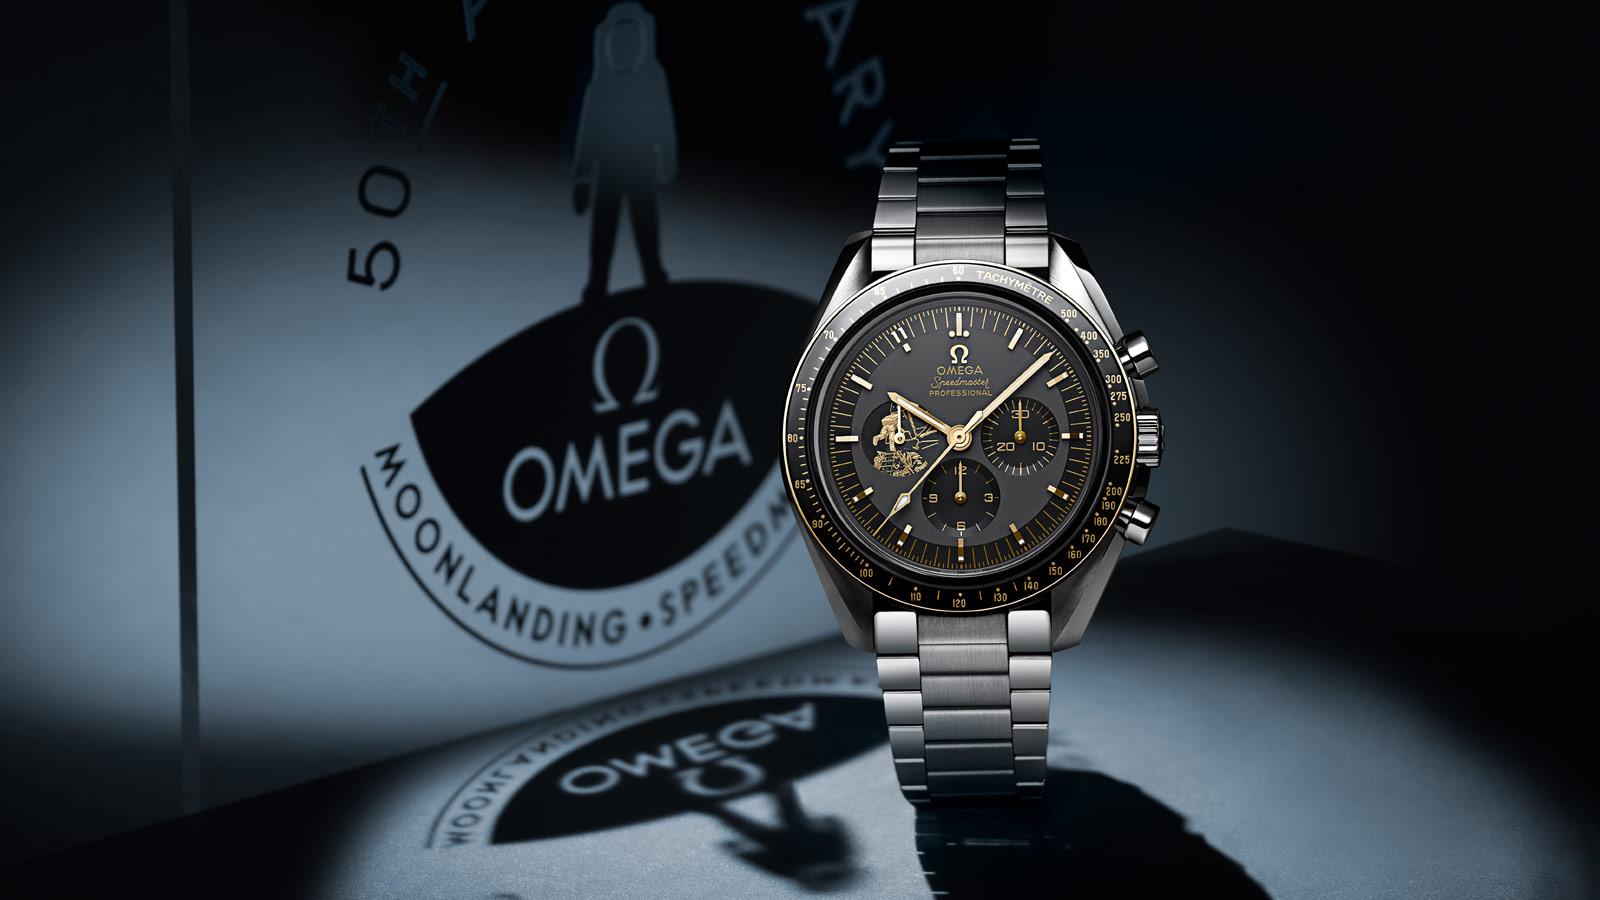 Omega Apollo